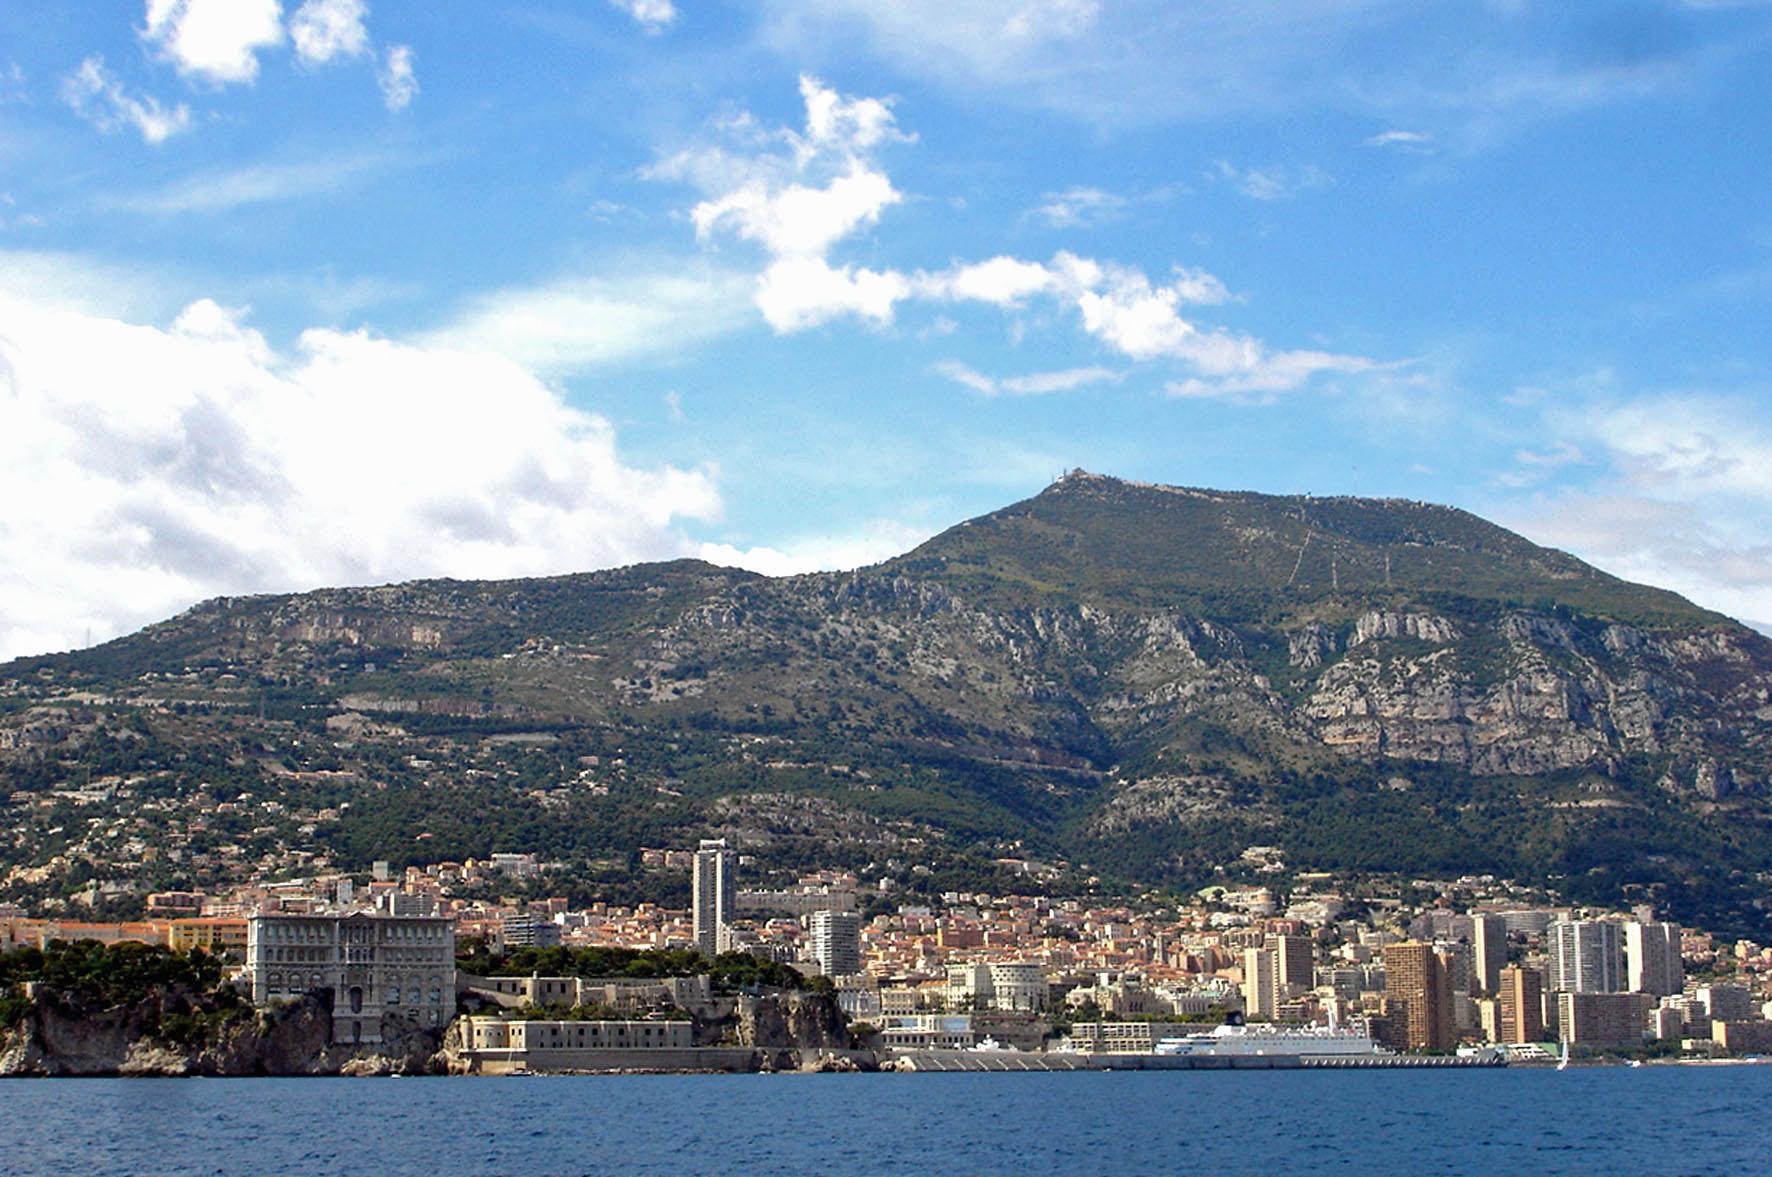 007passage Monaco.jpg